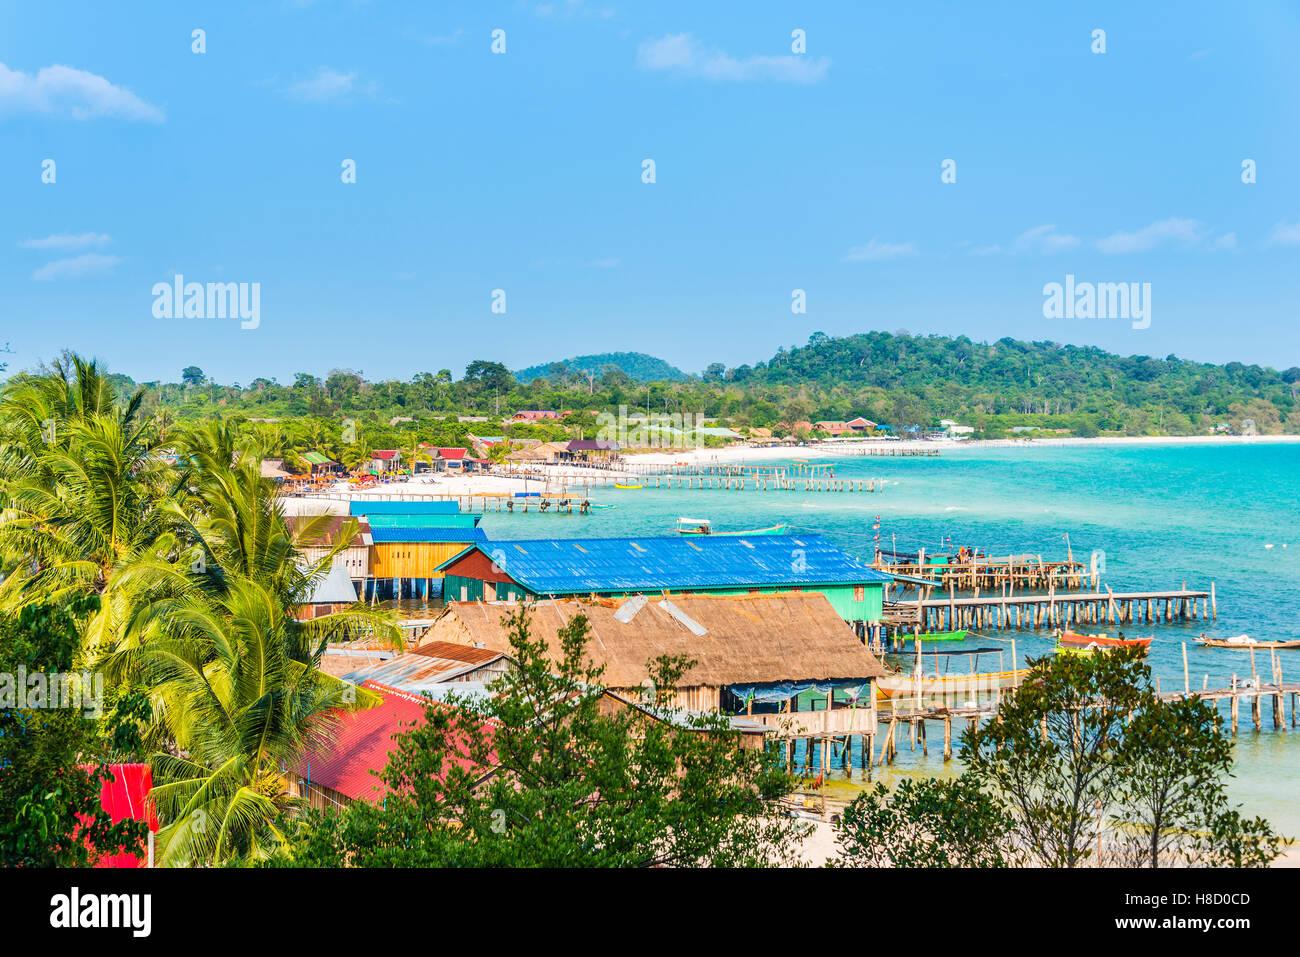 View of buildings and piers of Long Beach, Sok San Village, Koh Rong Island, Krong Preah Sihanouk, Sihanoukville, - Stock Image